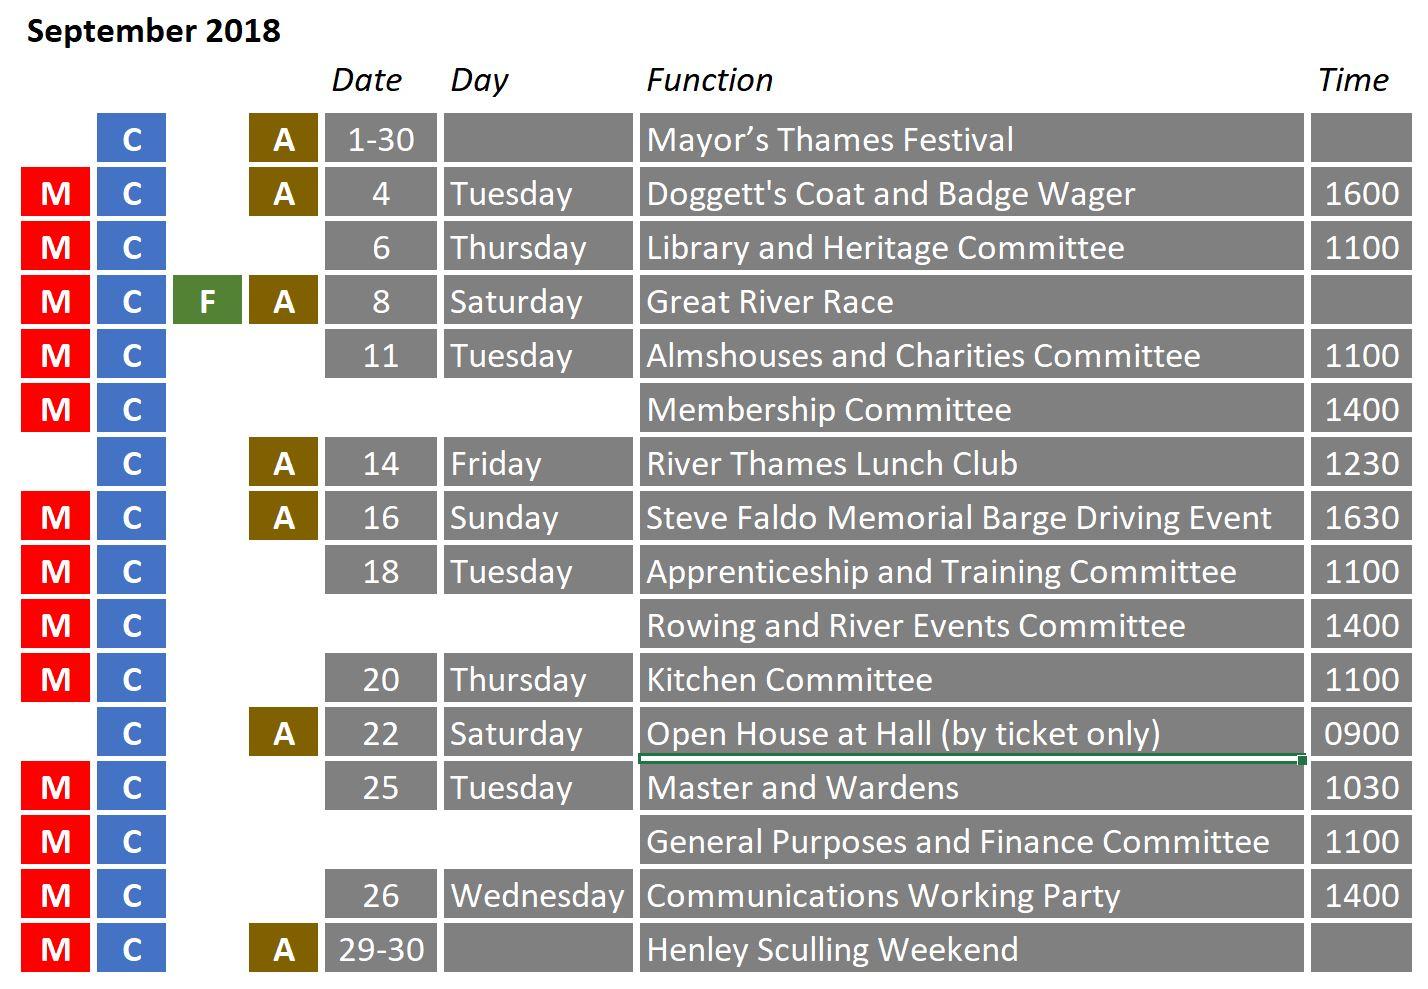 Calendar - September 2018 - Watermen and Lightermen